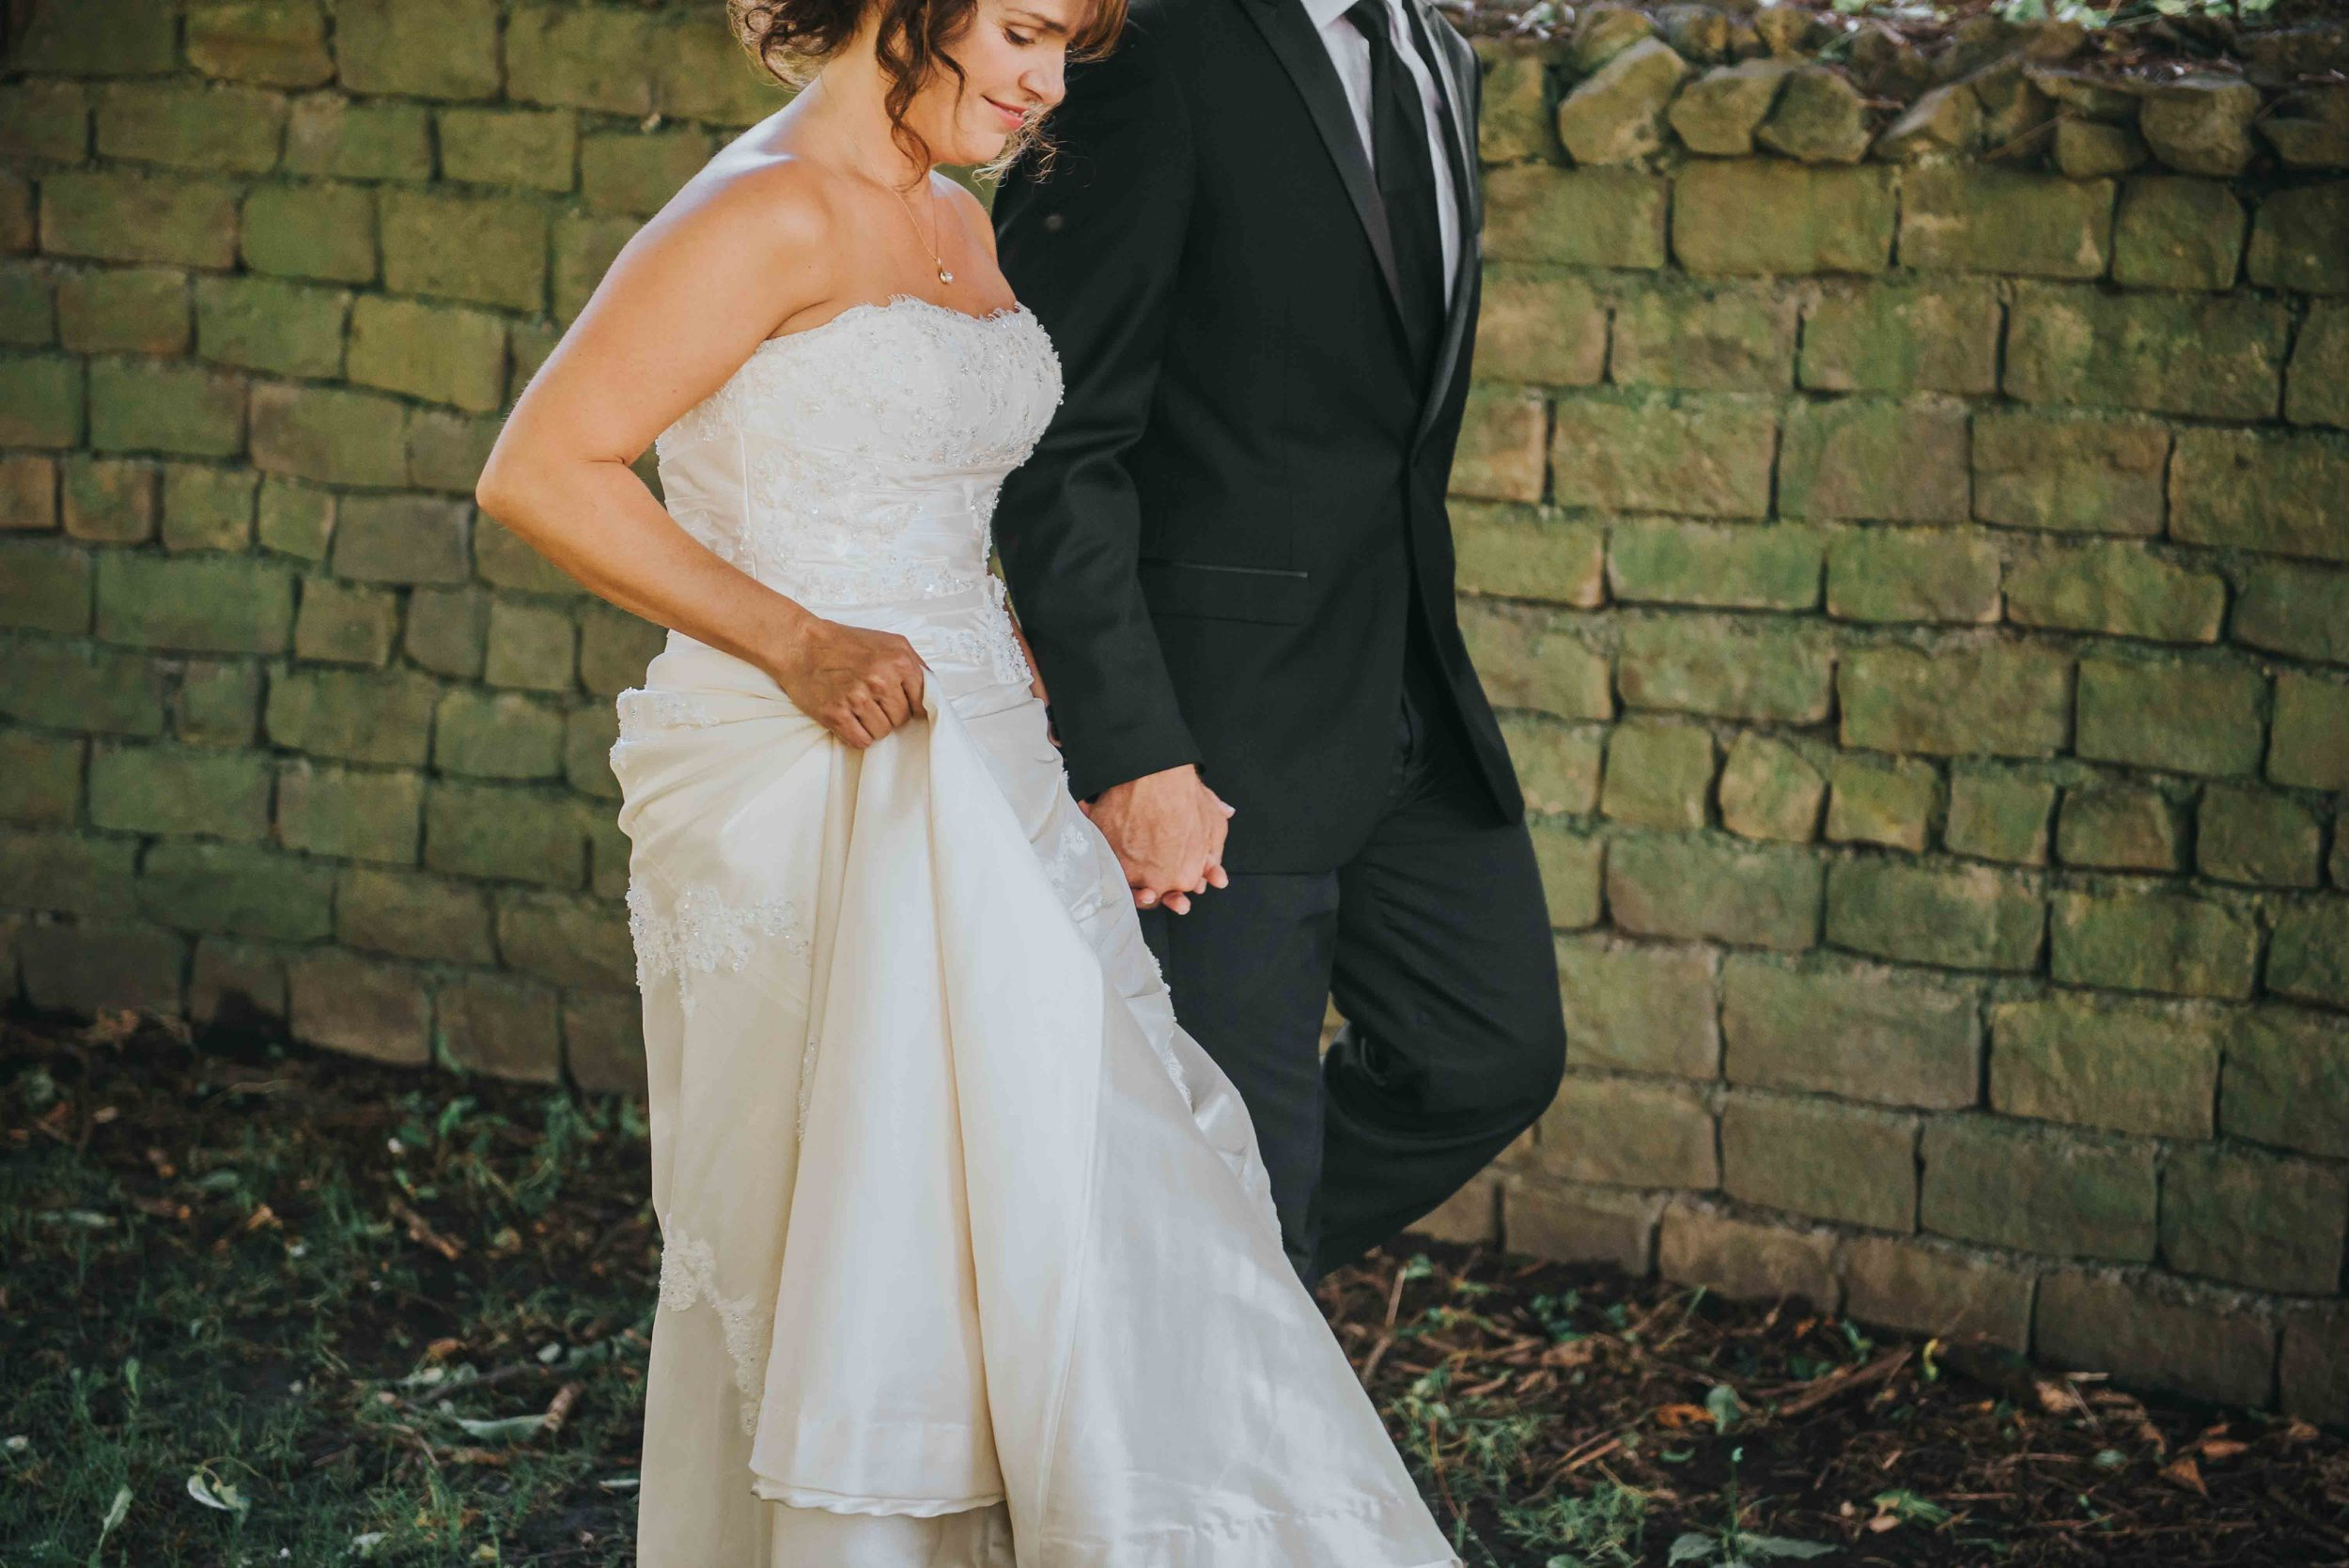 Cap-Sante-Wedding-J-Hodges-Anacortes-14.jpg